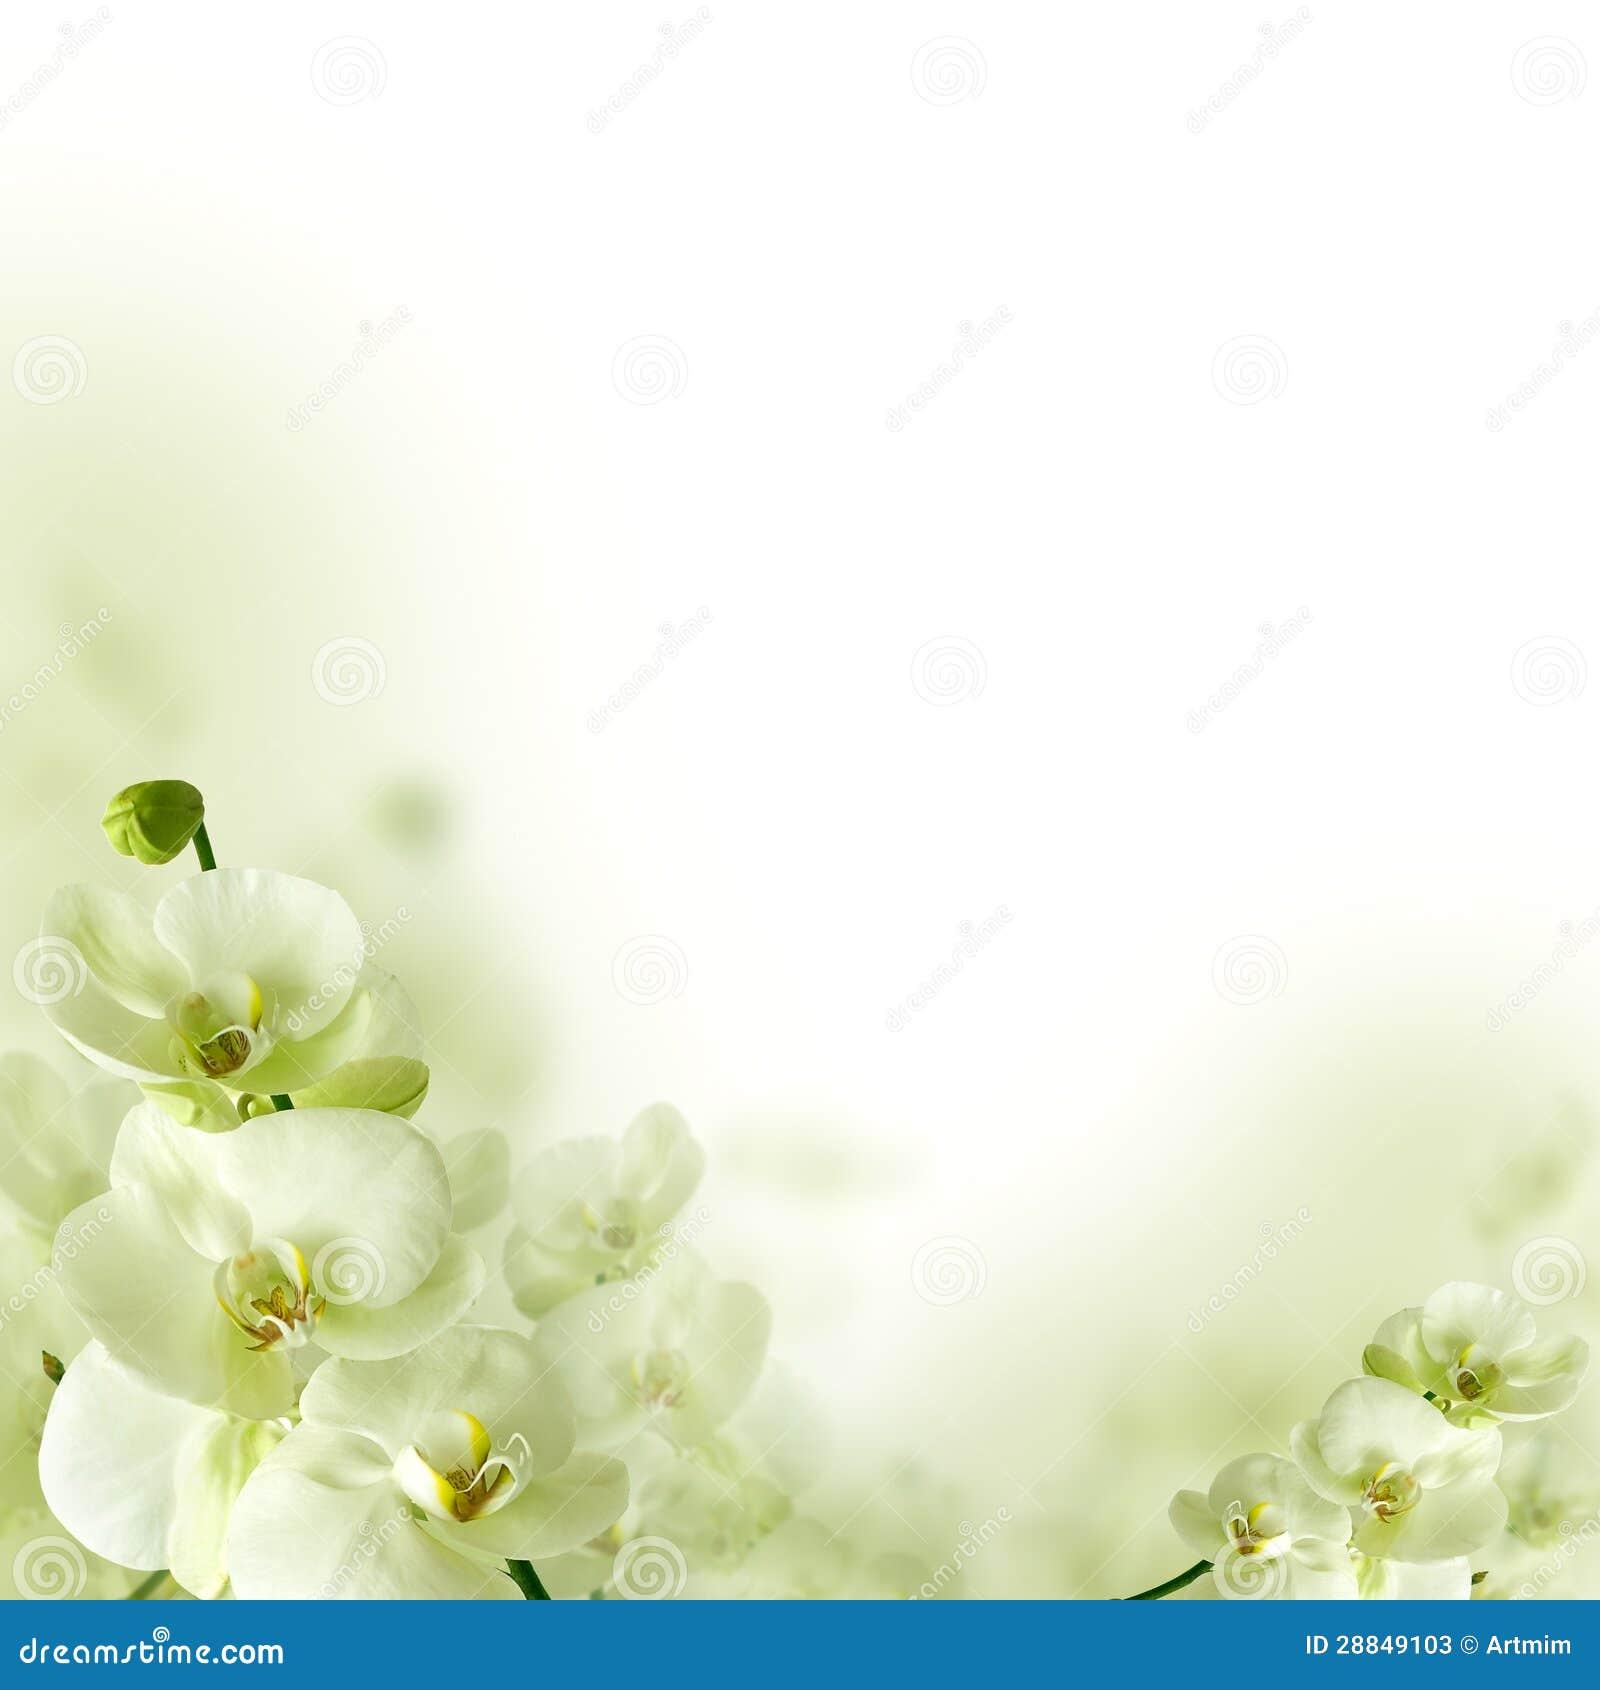 Flores da orquídea e hortaliças, fundo floral